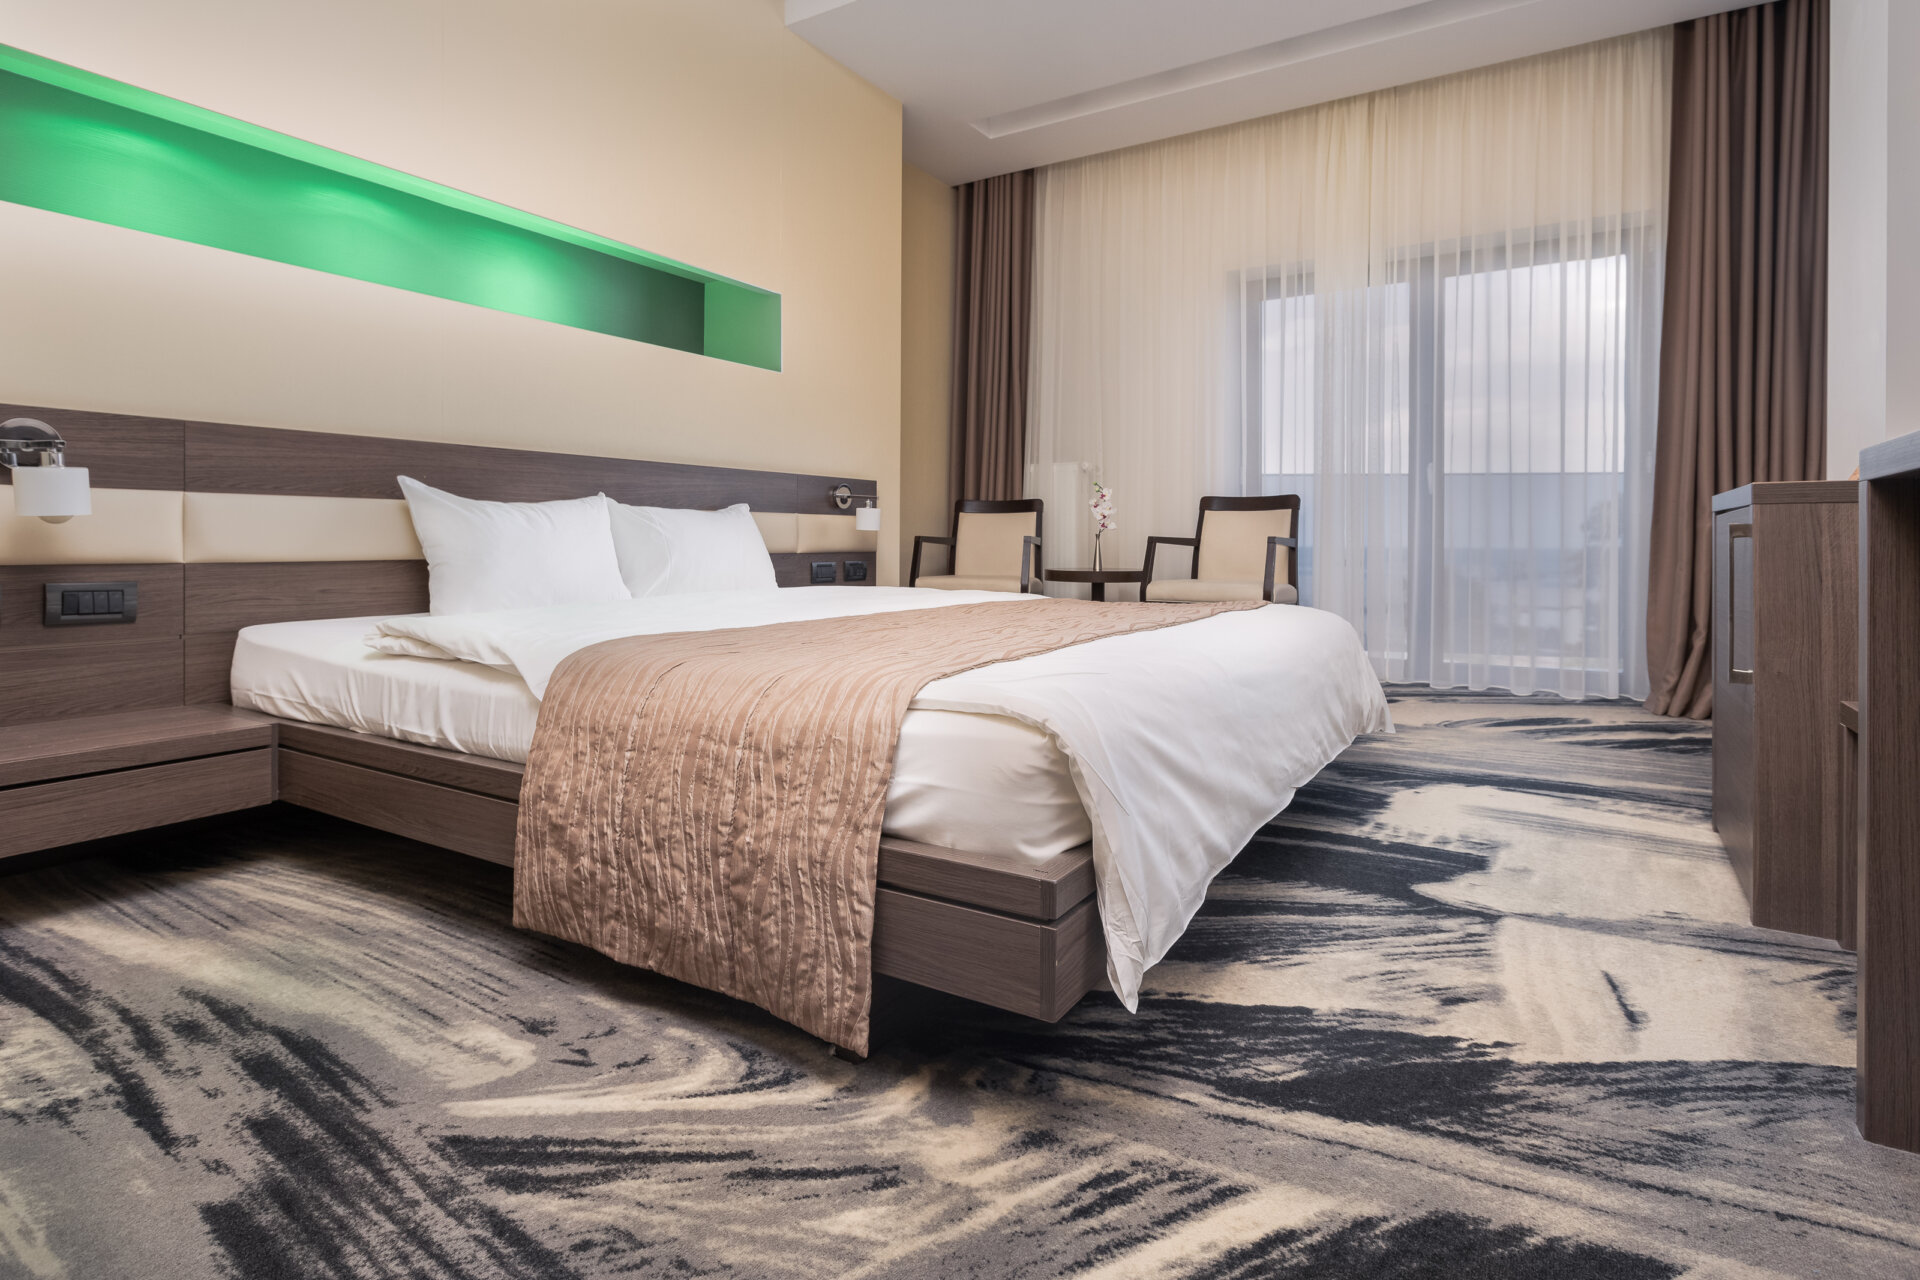 20210524-carpet&more-mamaia-hotel-scapino-by-hugmedia-001